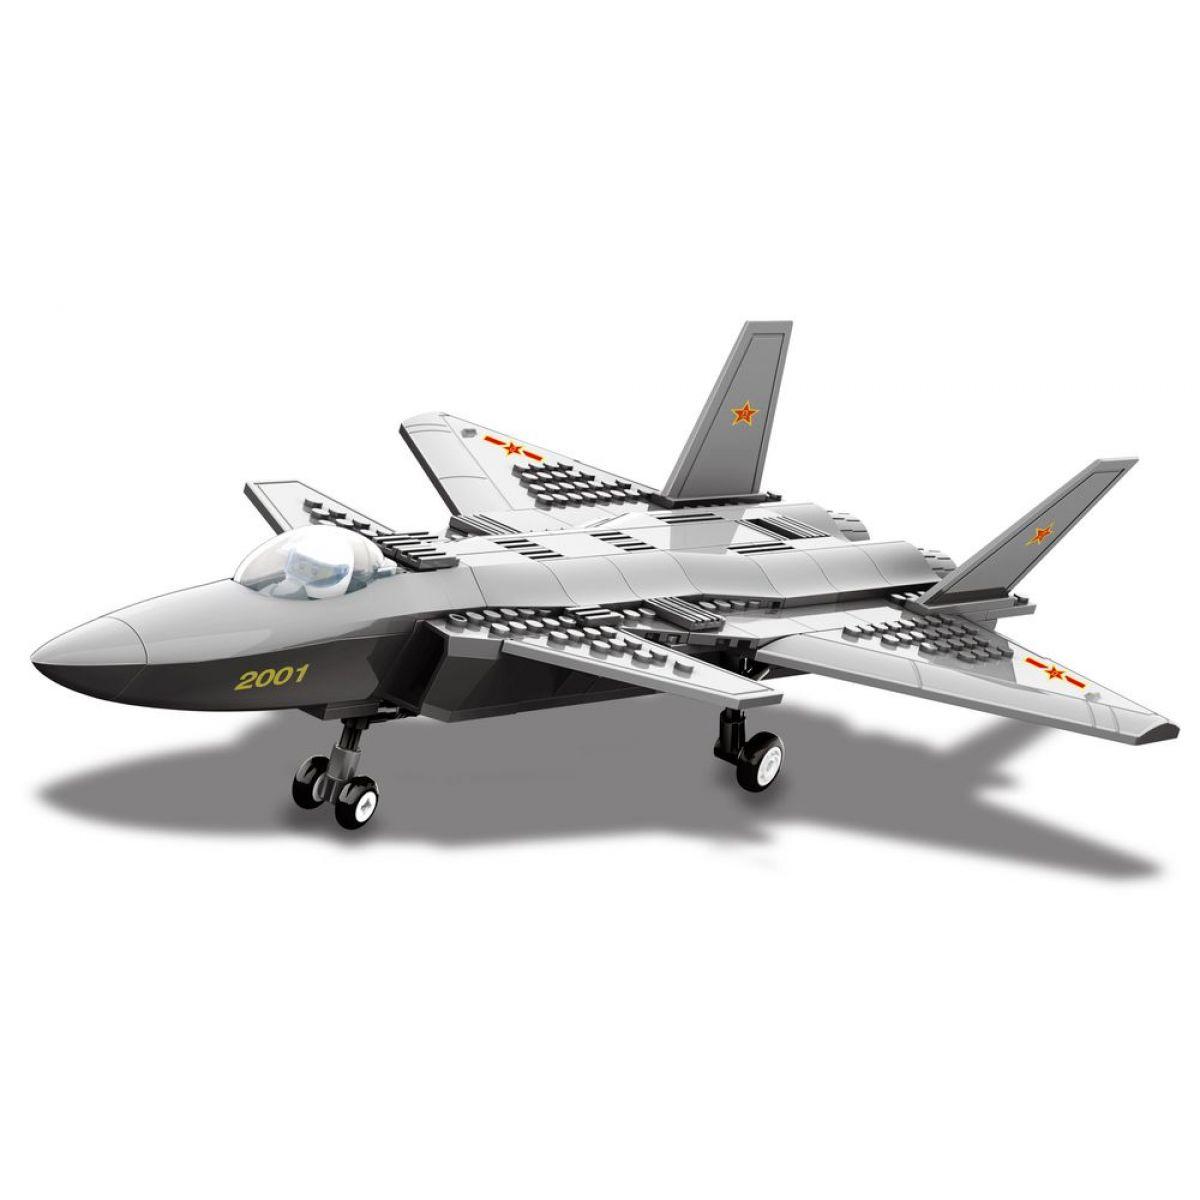 Stavebnice J20 Heavy Stealth Fighter 296 dílků